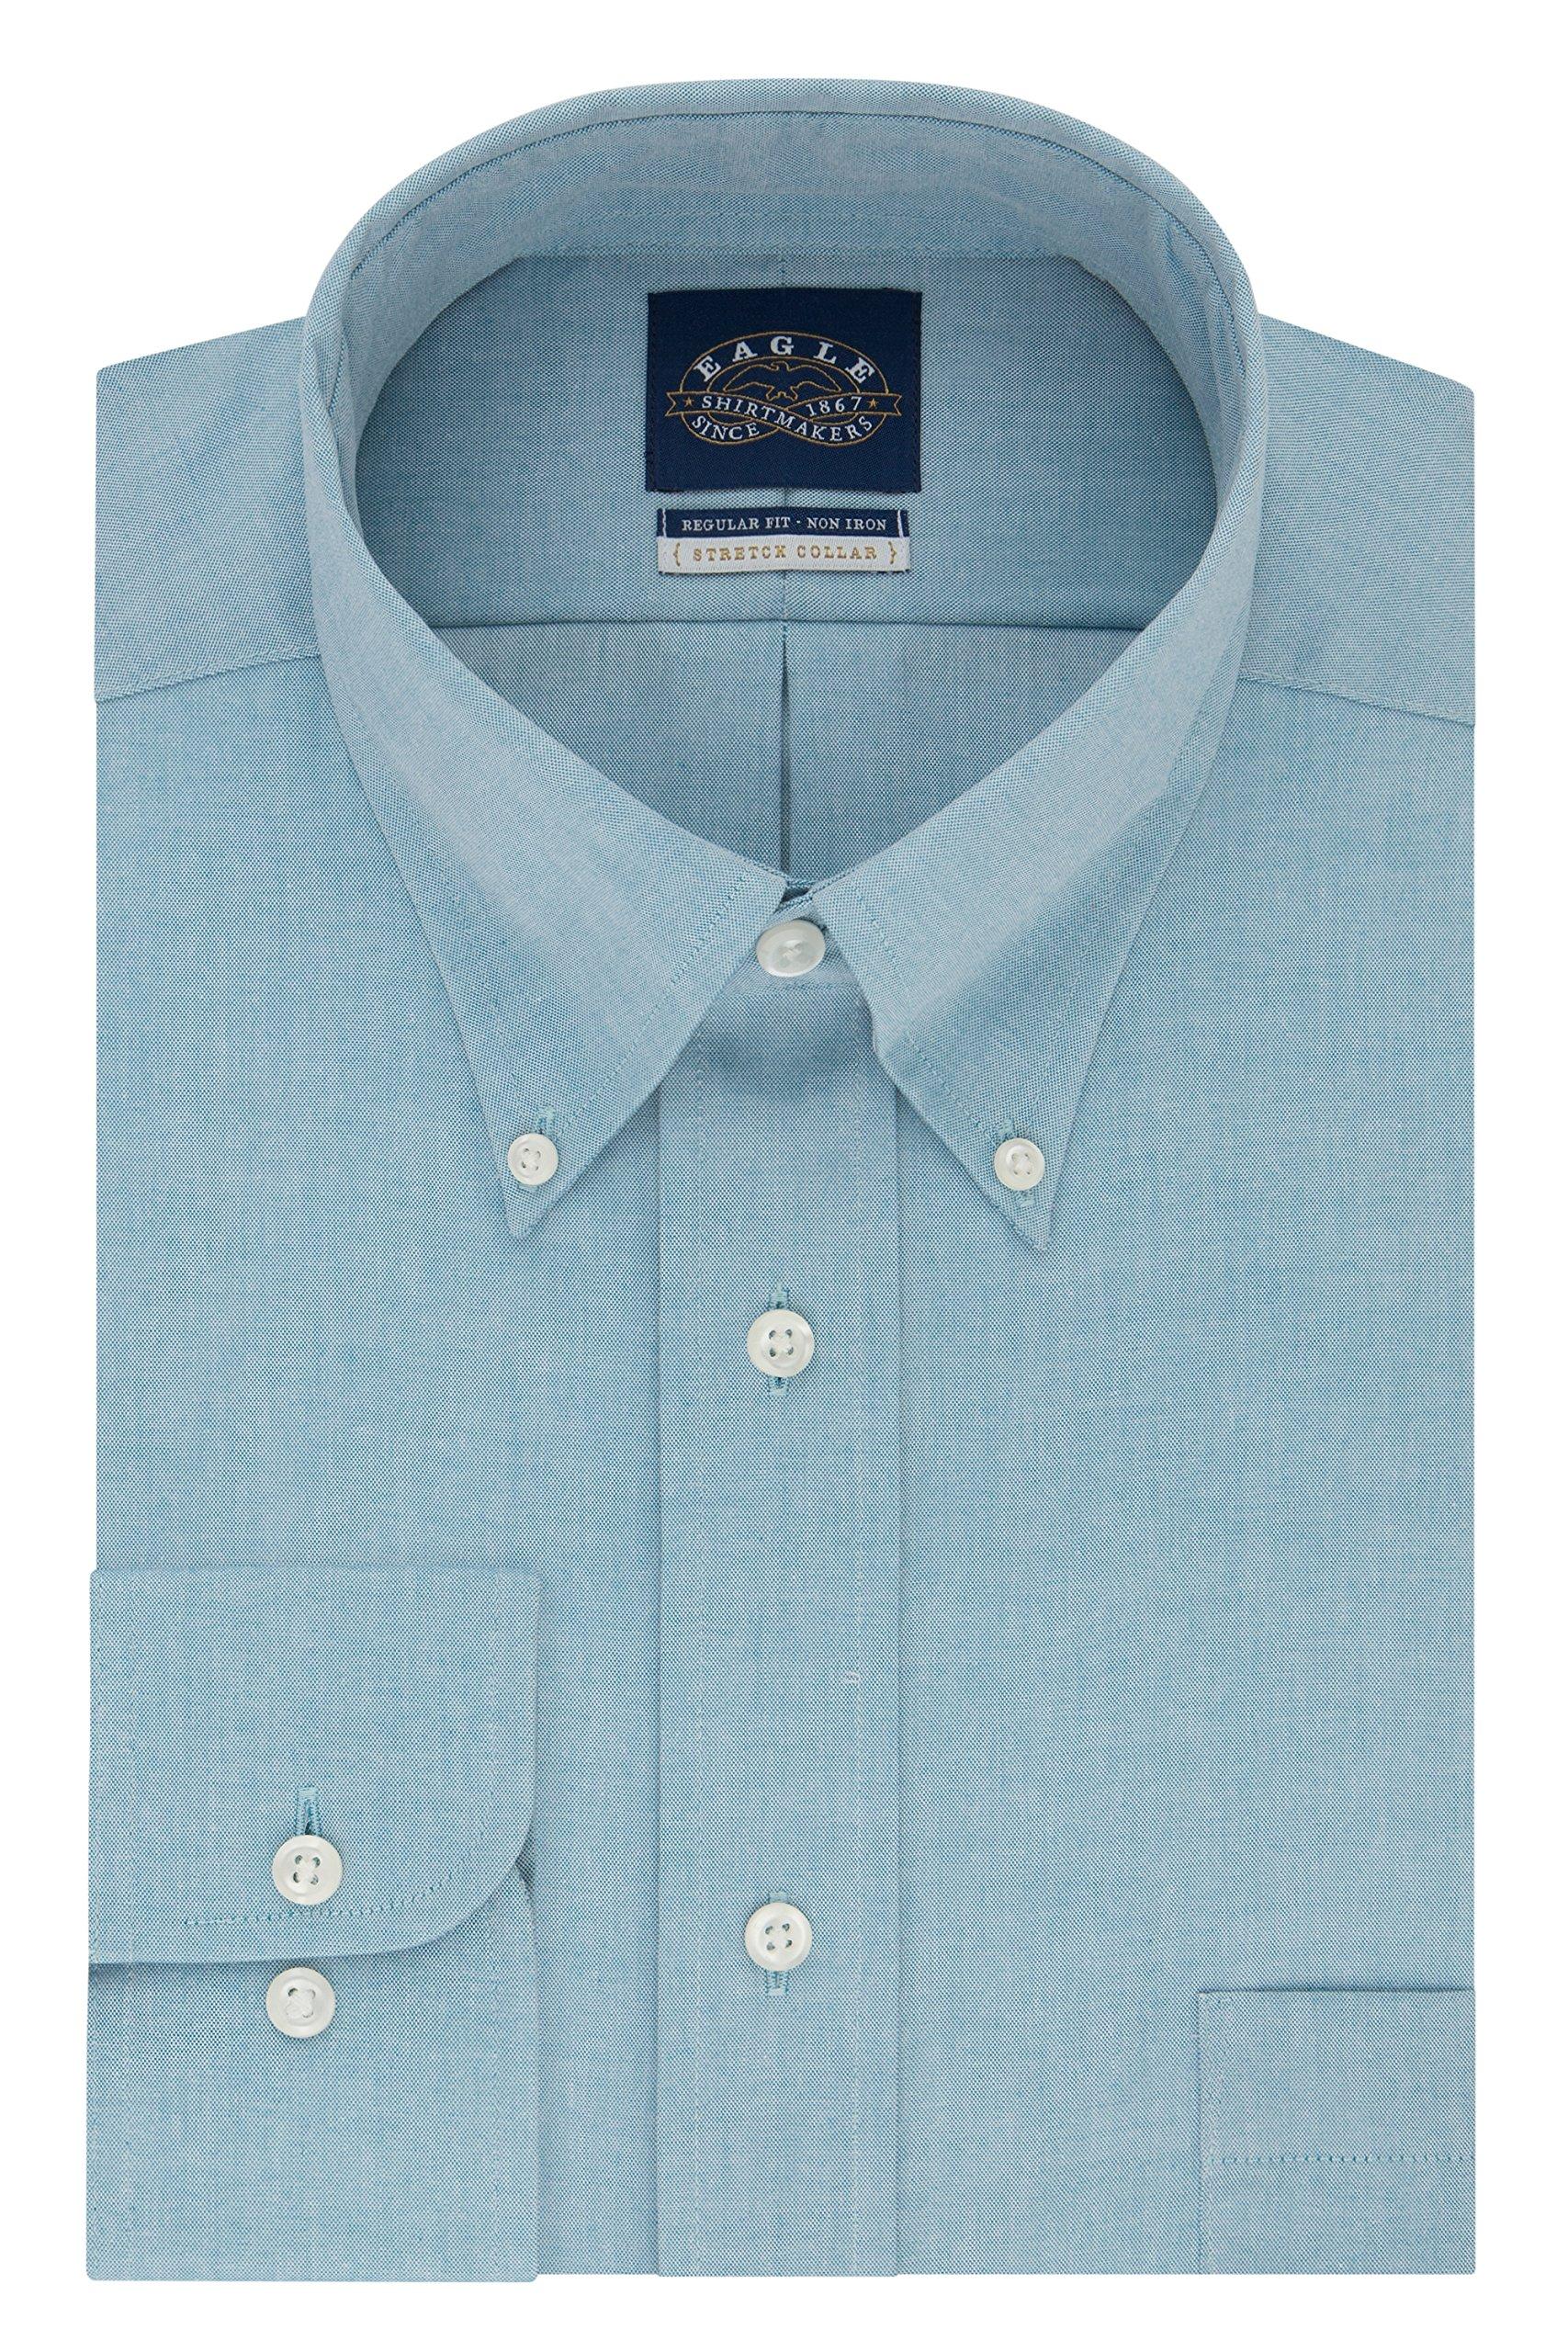 Eagle Men's Non Iron Stretch Regular Fit Solid Buttondown Collar Dress Shirt, Green Sea, 16'' Neck 32''-33'' Sleeve